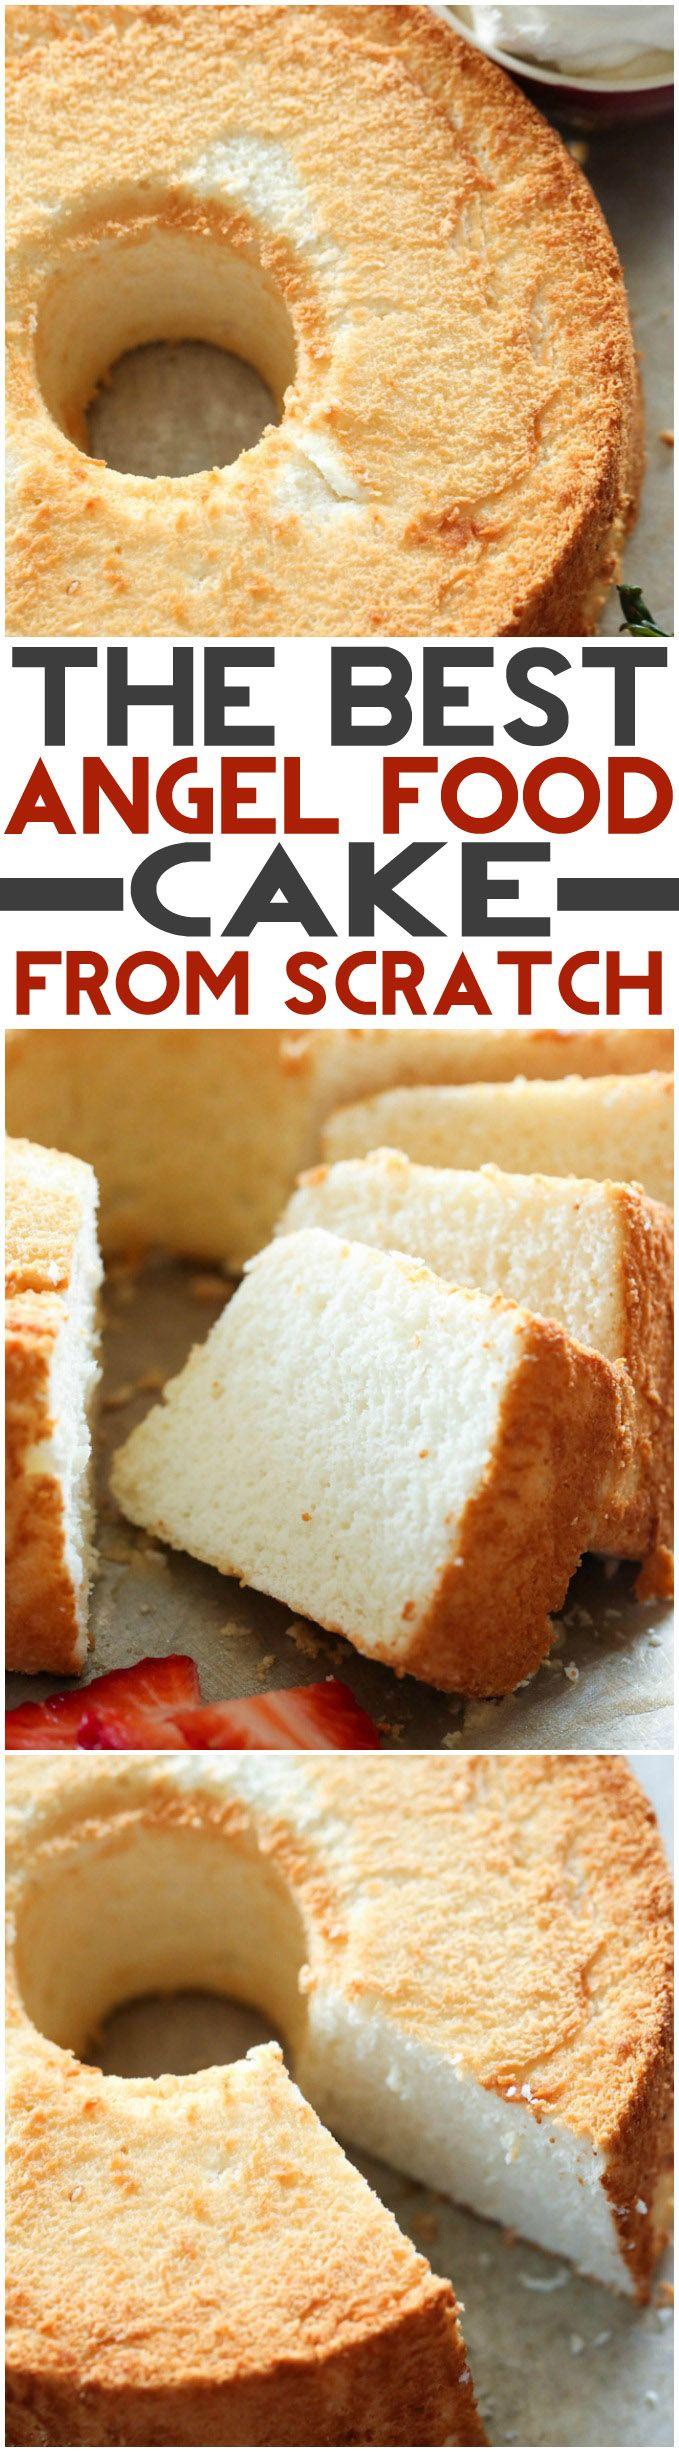 Lemon angel food cake recipe from scratch